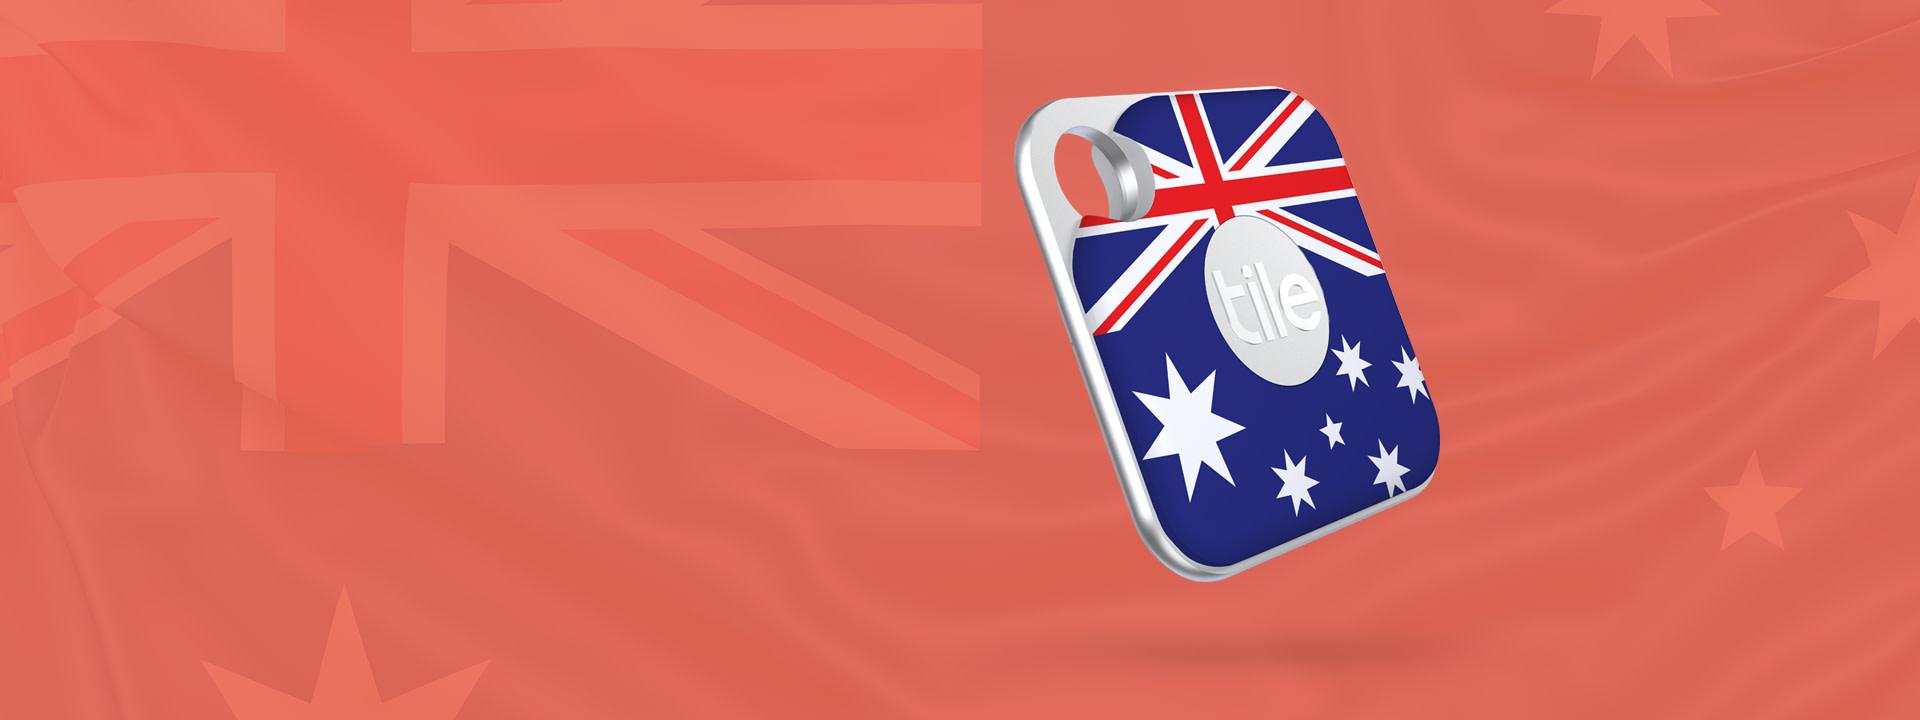 WIN20-Desktop-Australia-Spirit-Pro-Marquee-49-50-ALT